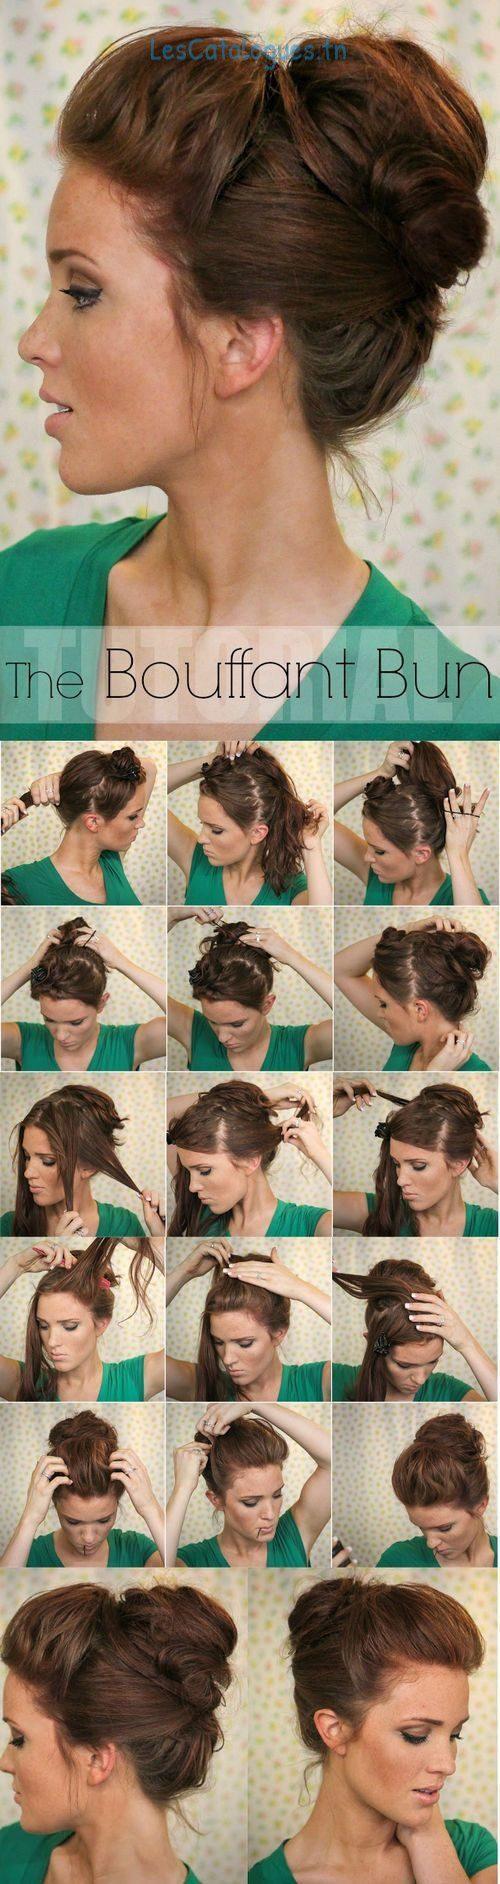 coiffure-cheveux-6